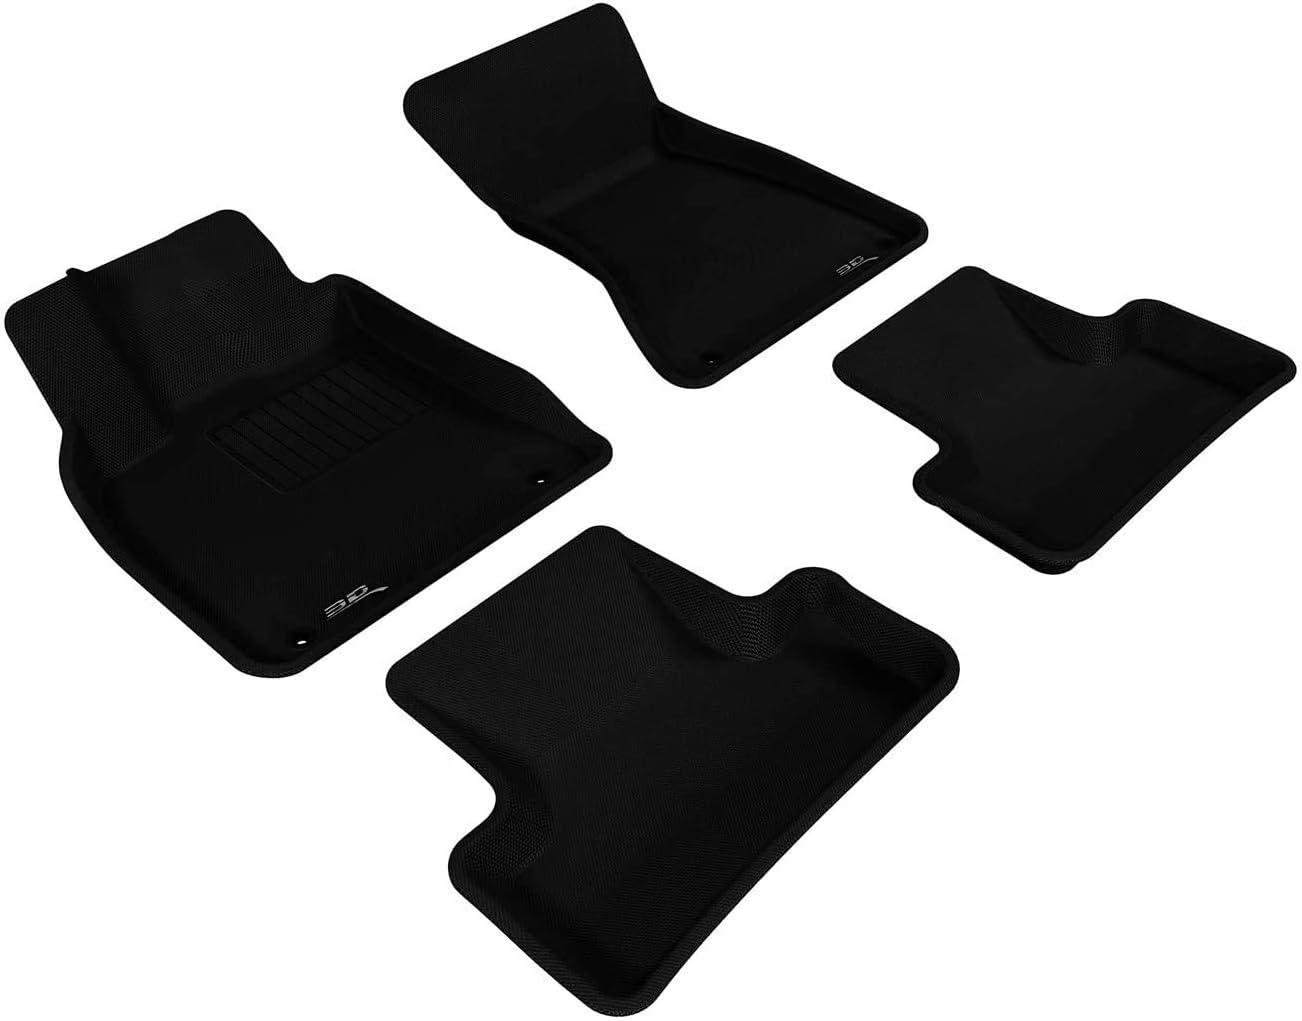 L1FA00521509 Second Row Custom Fit All-Weather Floor Mat for Select Fiat 500X Models Black 3D MAXpider Kagu Rubber